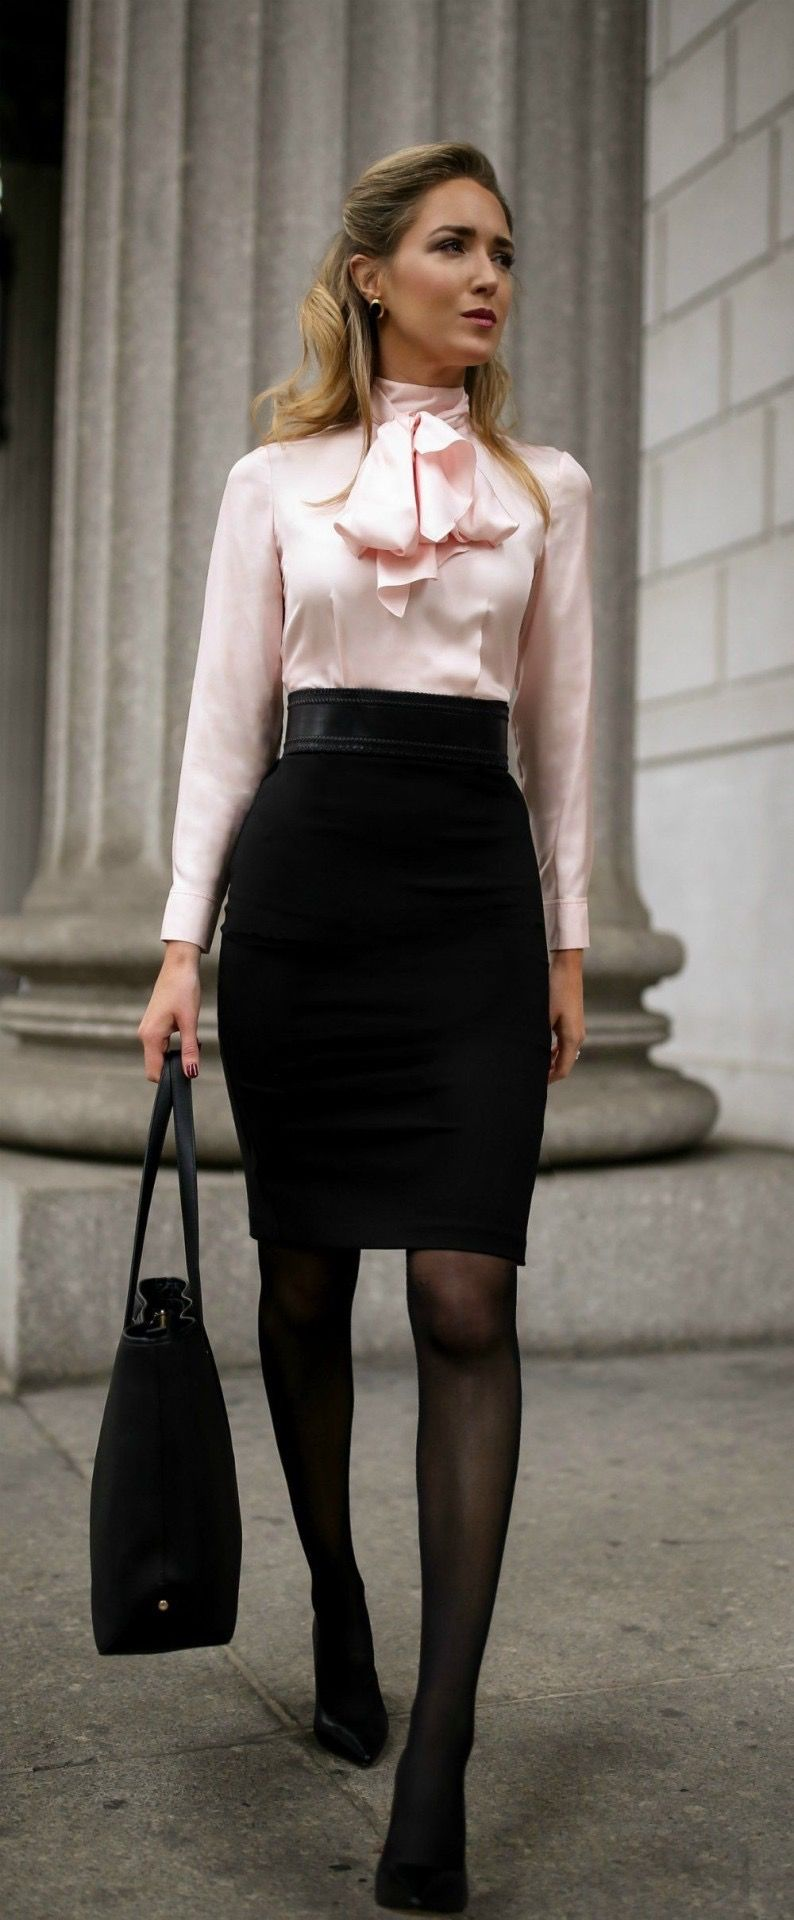 3f699639343 Pin by Natasa Timiadou on business attire in 2019 | Office attire ...